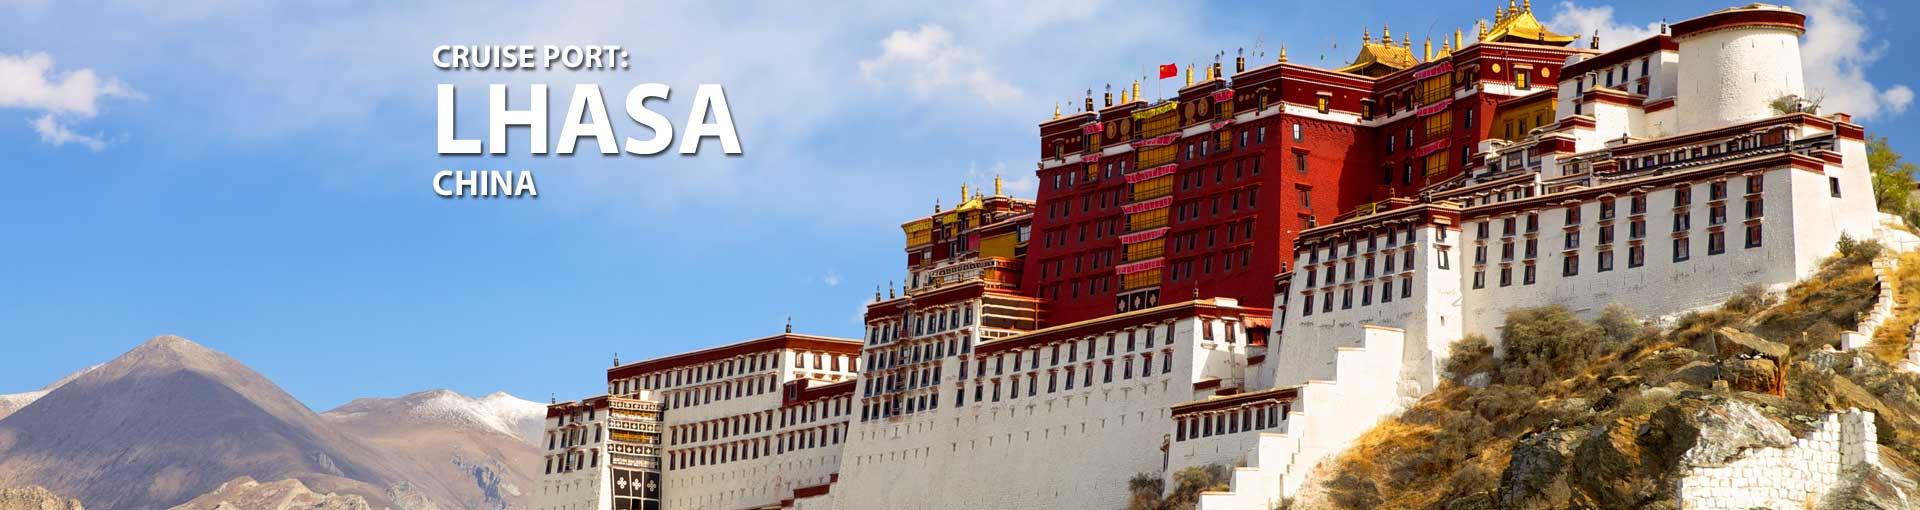 Cruises to Lhasa, China